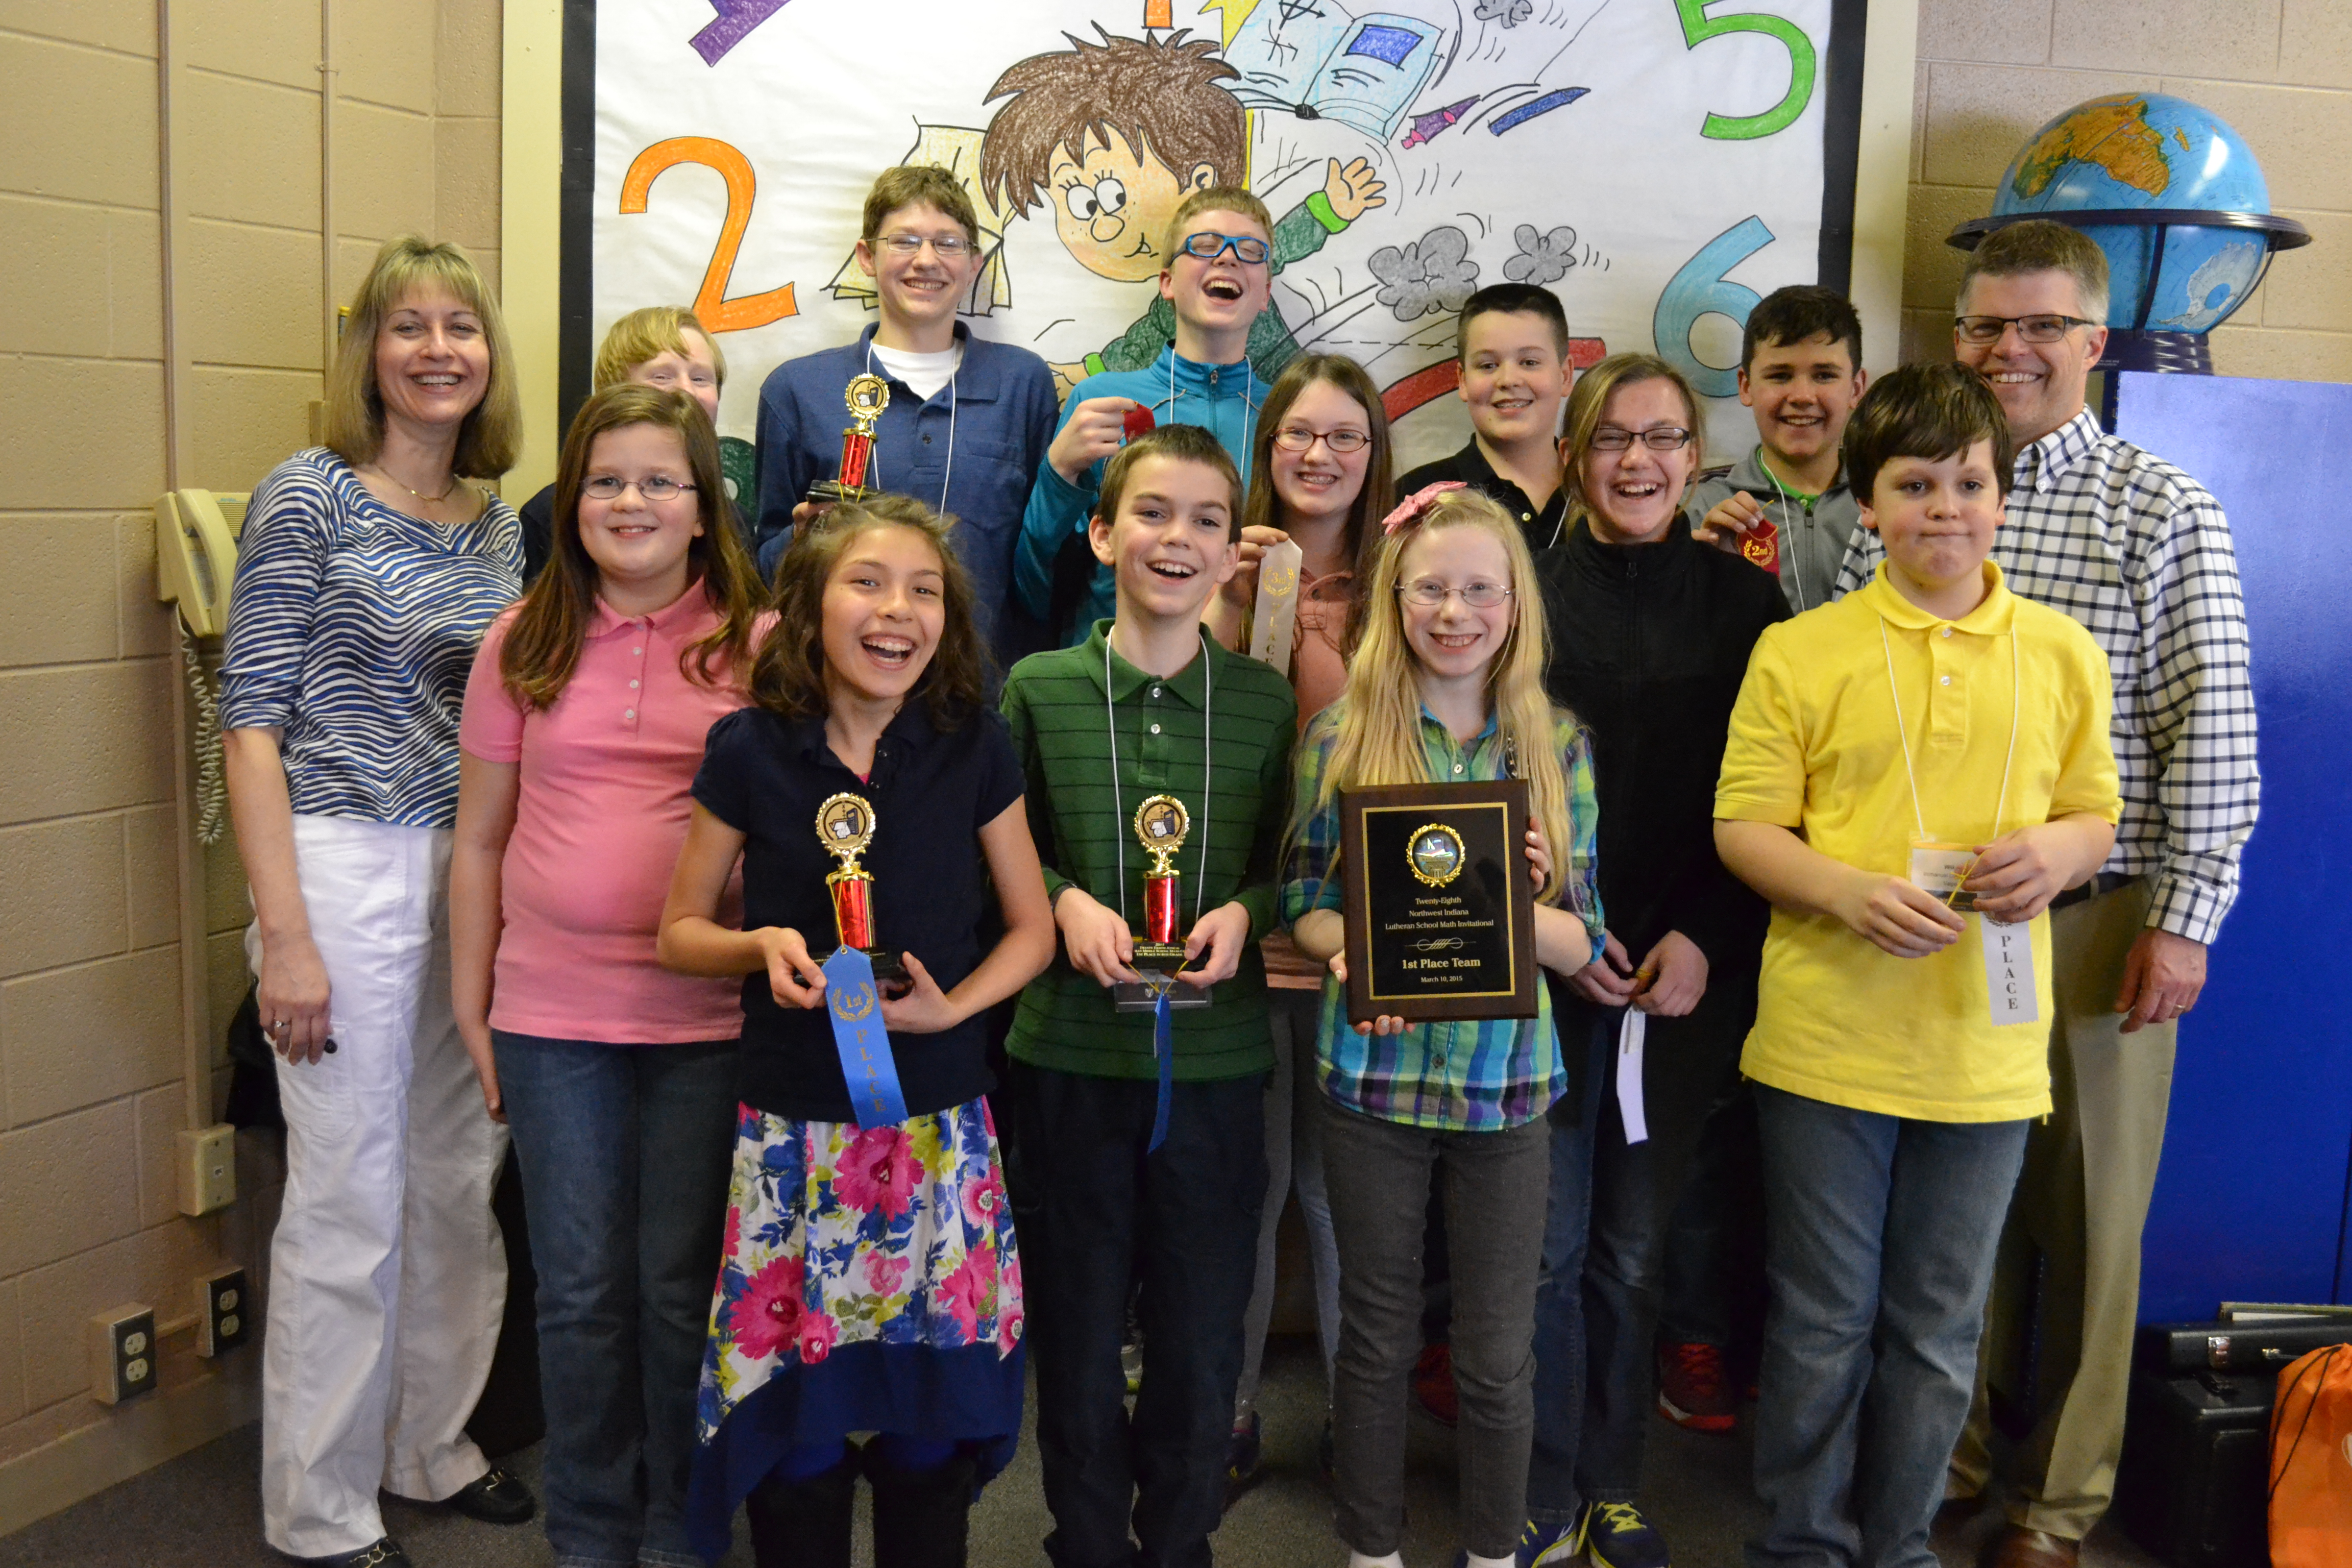 Immanuel Wins 2015 Math Bowl